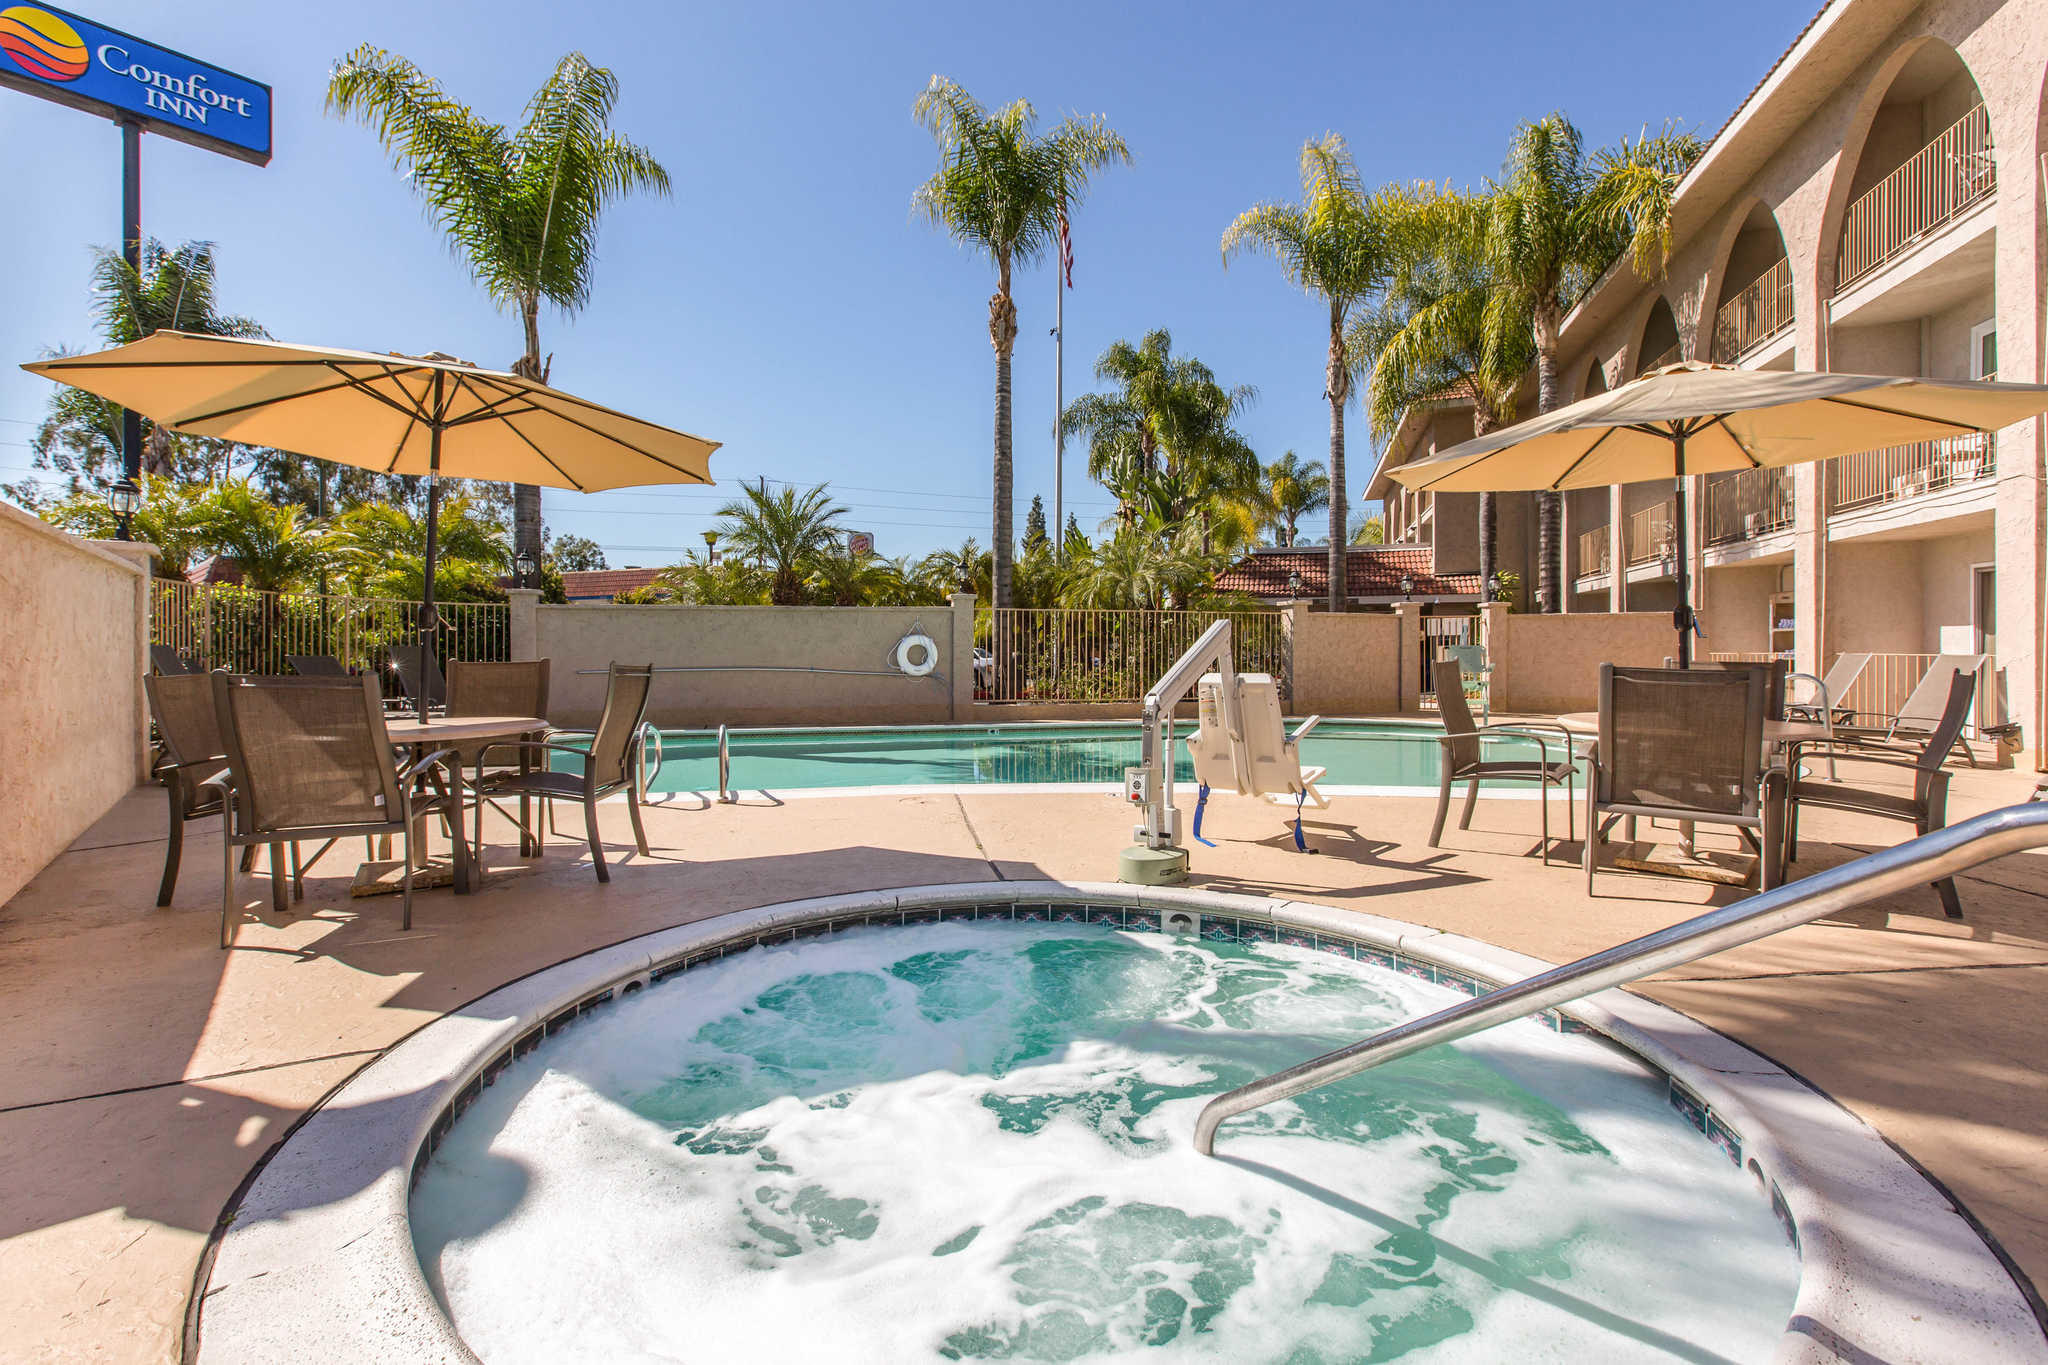 Comfort Inn Escondido San Diego North County image 34